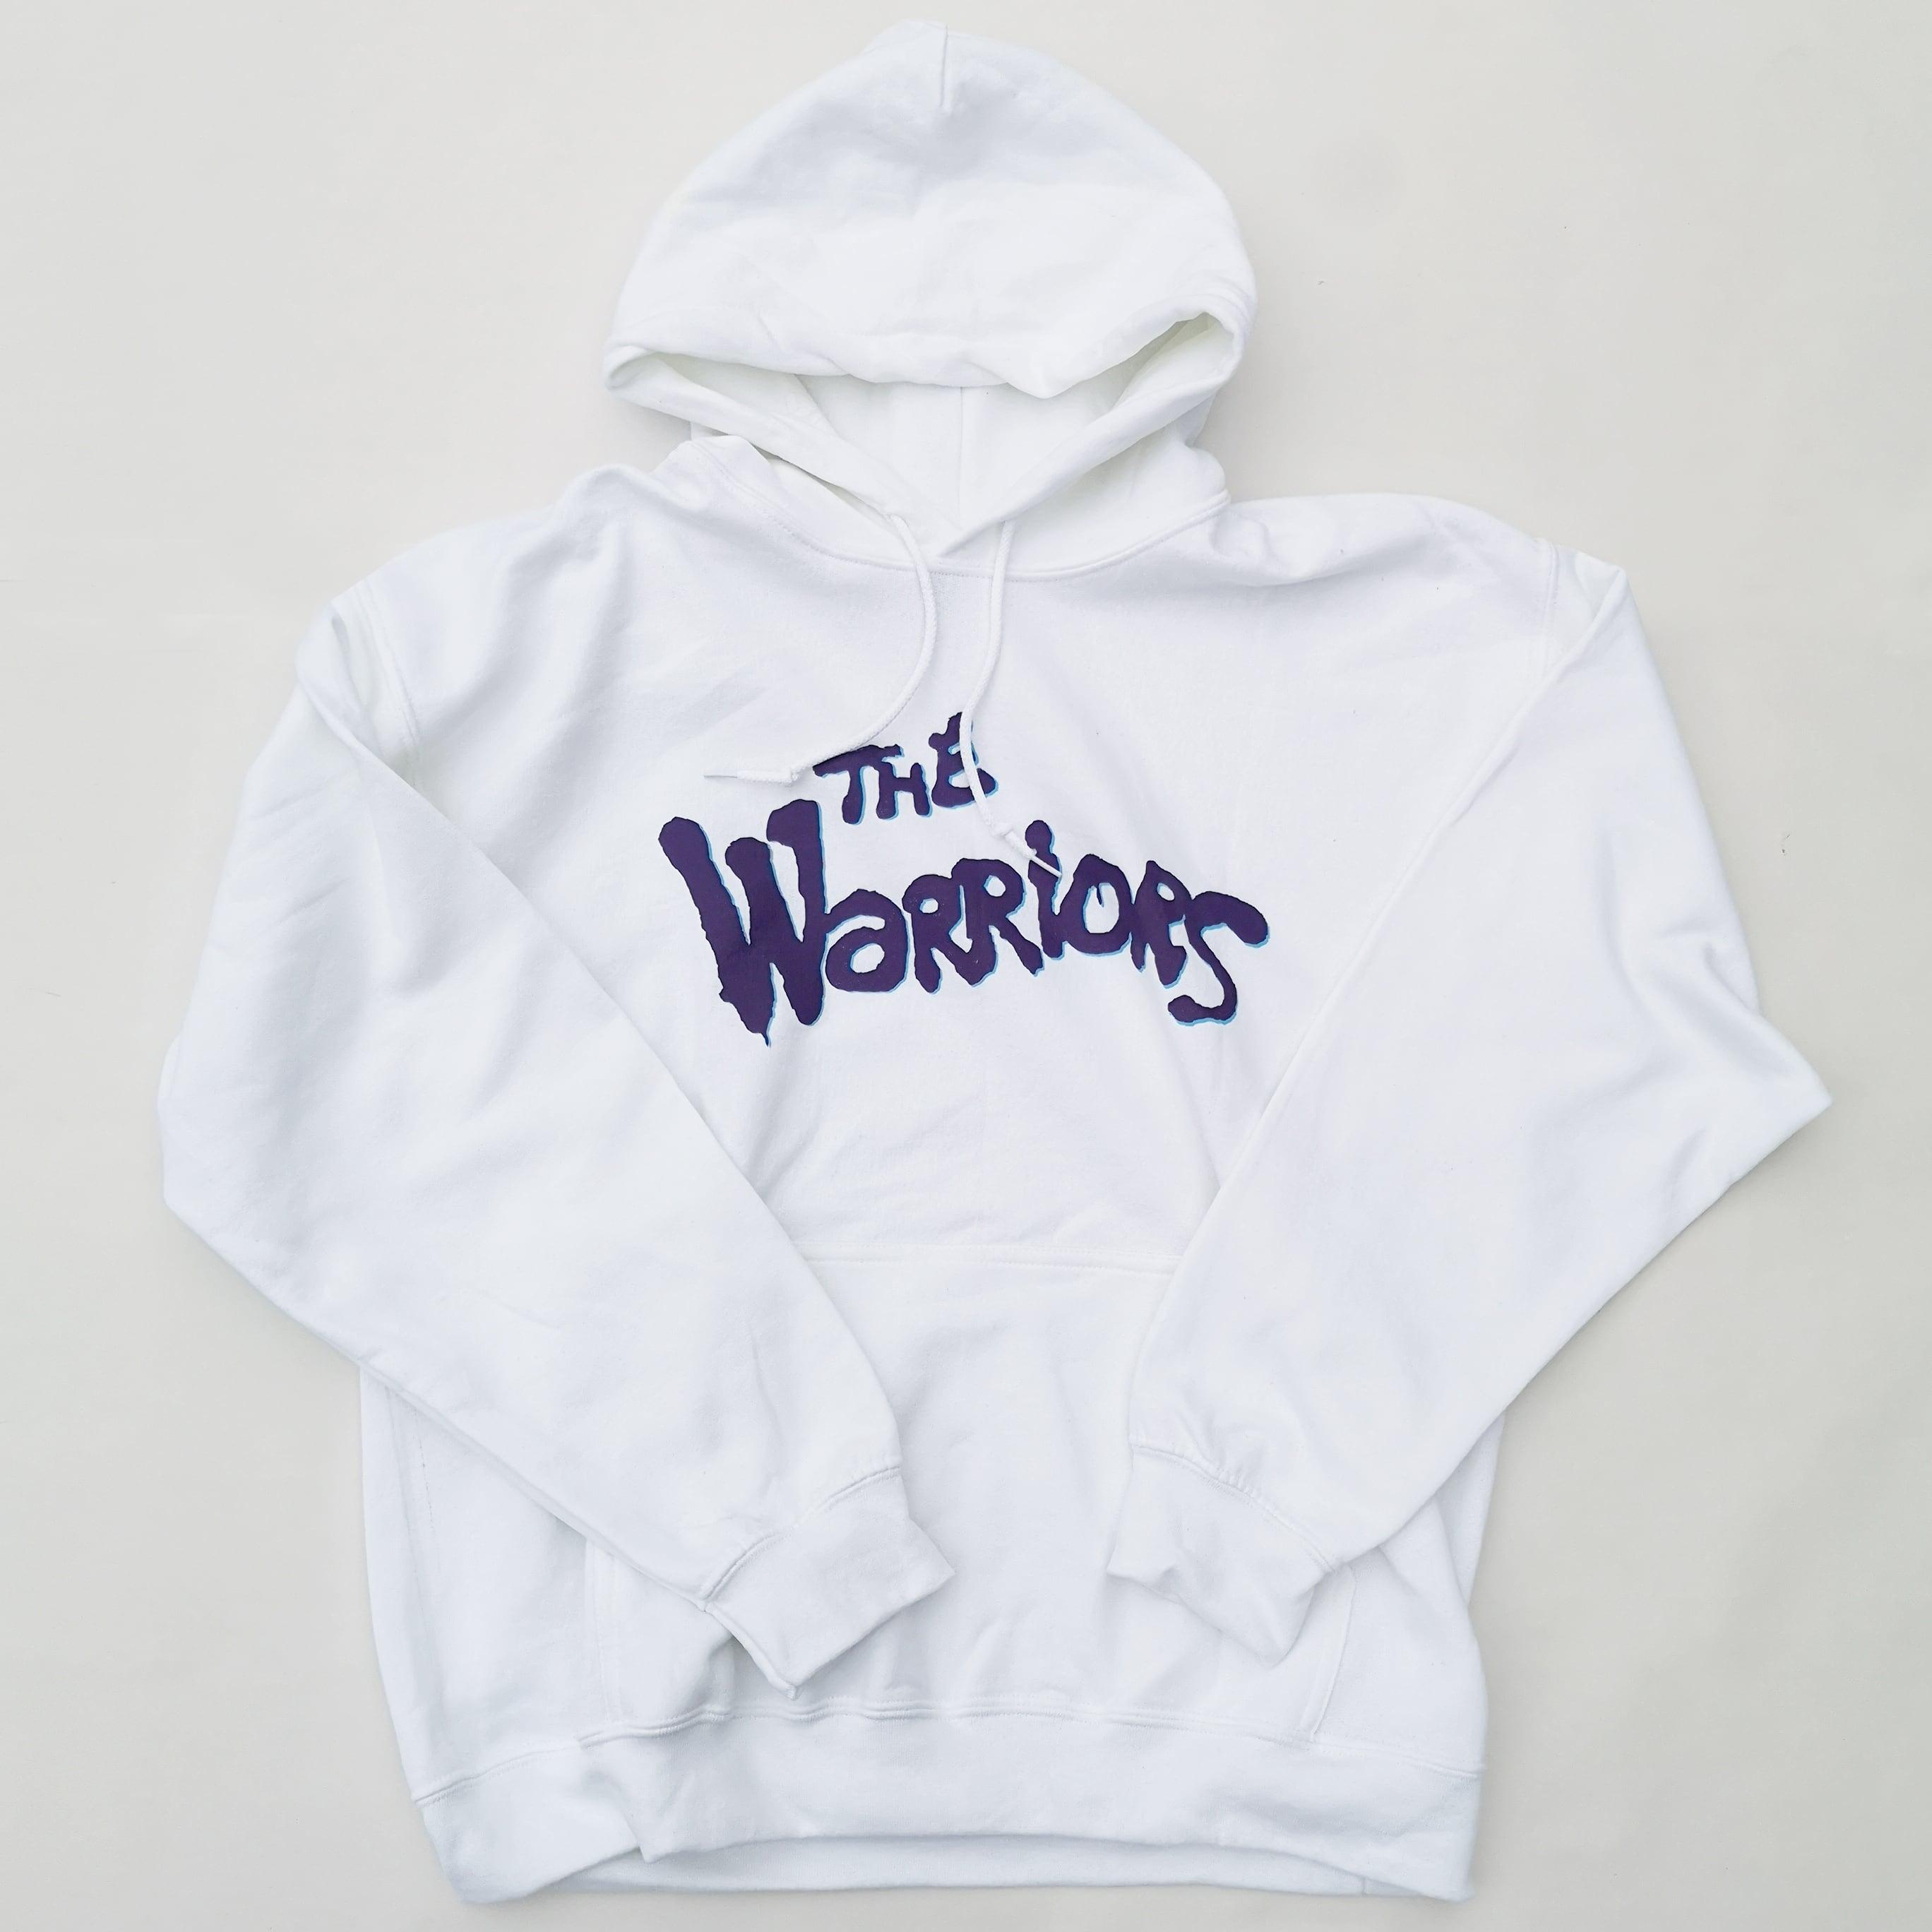 ||||| THE WARRIORS HOODIE